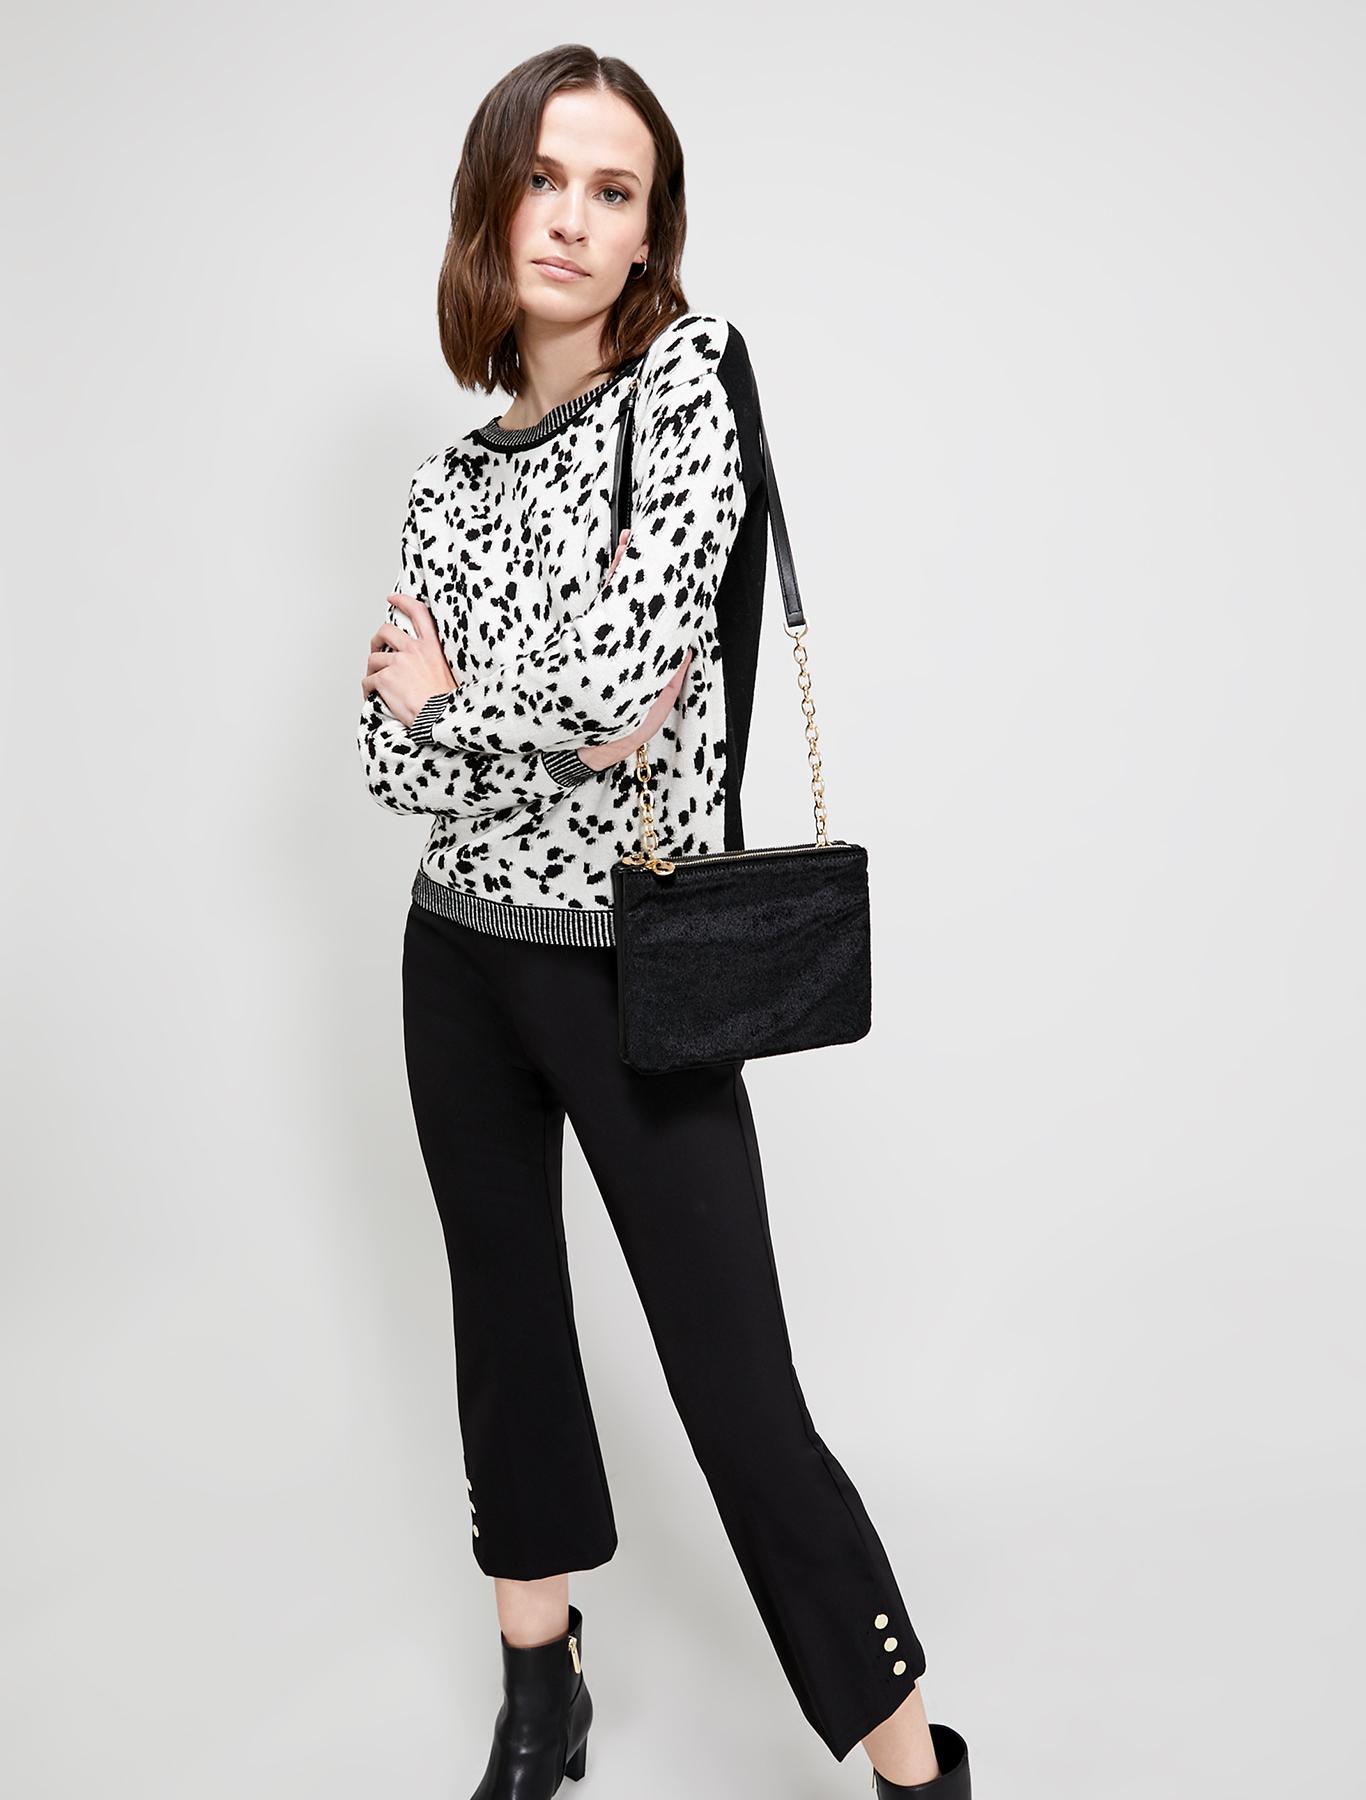 Dalmatian jacquard jumper - black - pennyblack